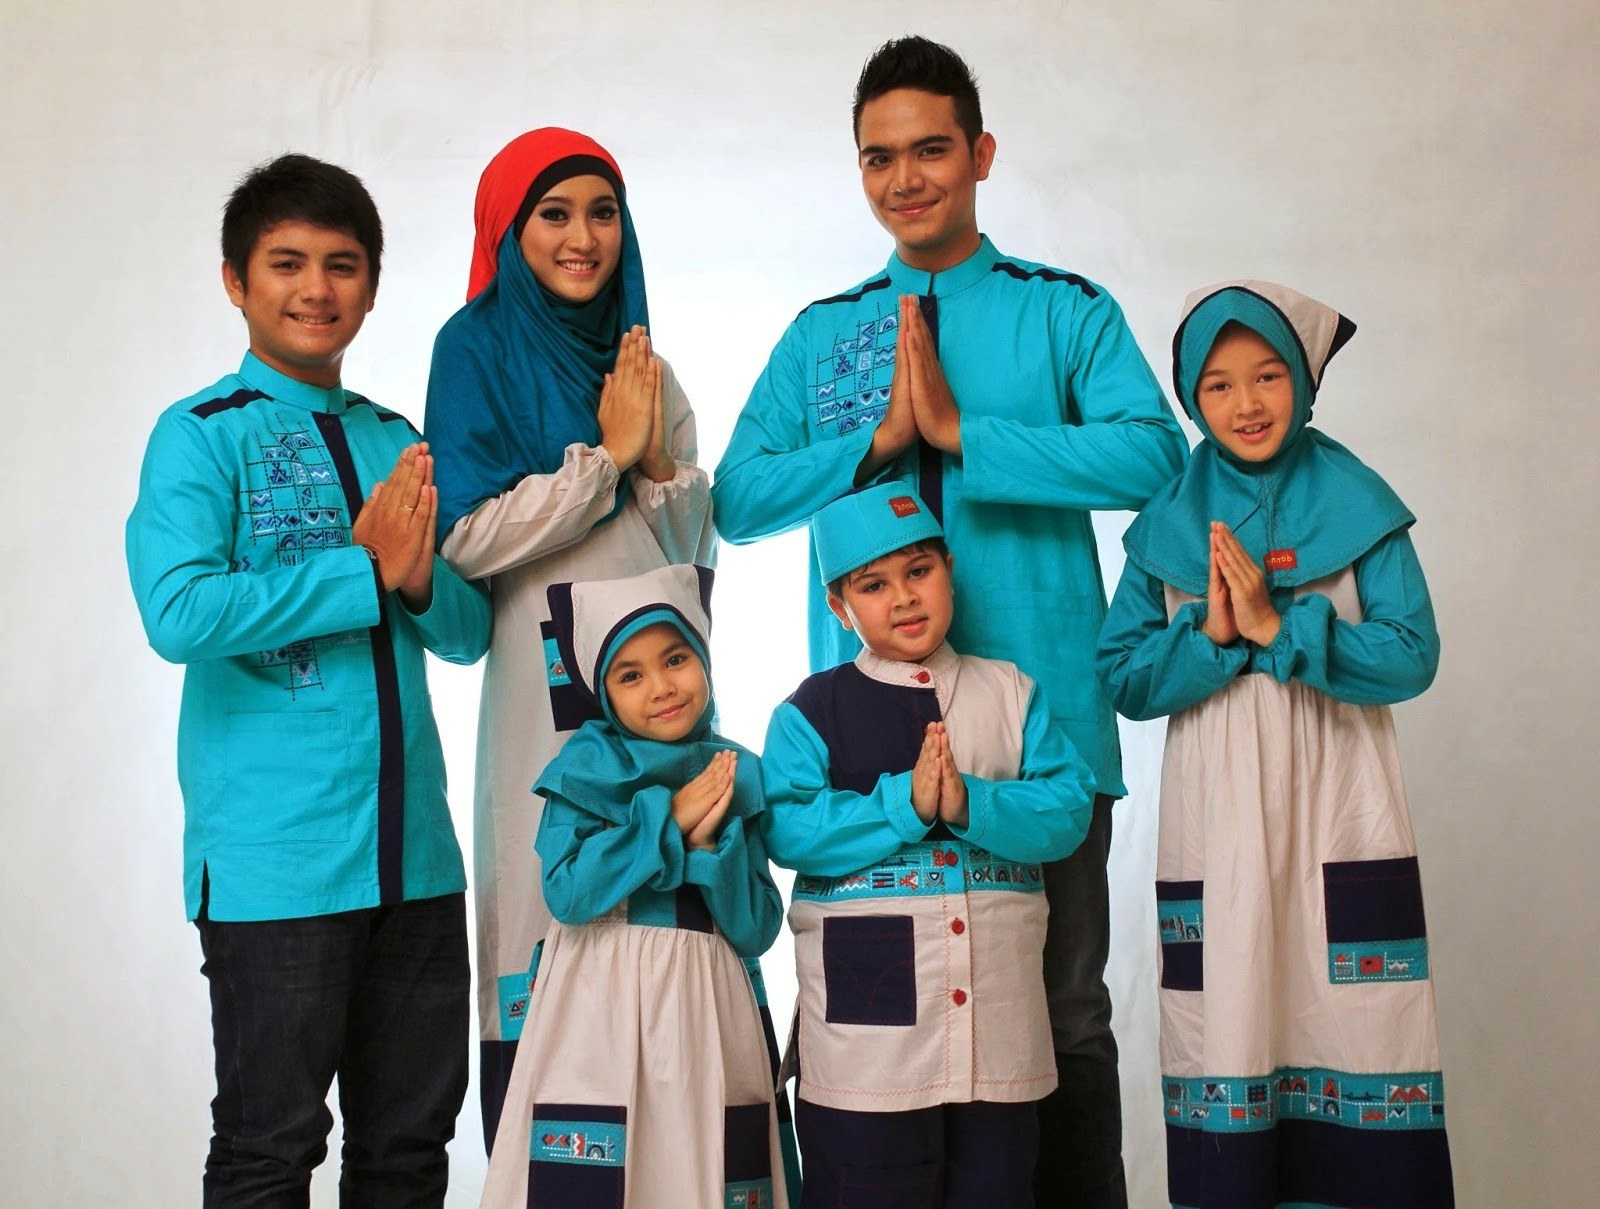 Bentuk Baju Lebaran Keluarga 2018 Irdz Model Baju Muslim Gamis Modern Terbaru 2018 Untuk Lebaran